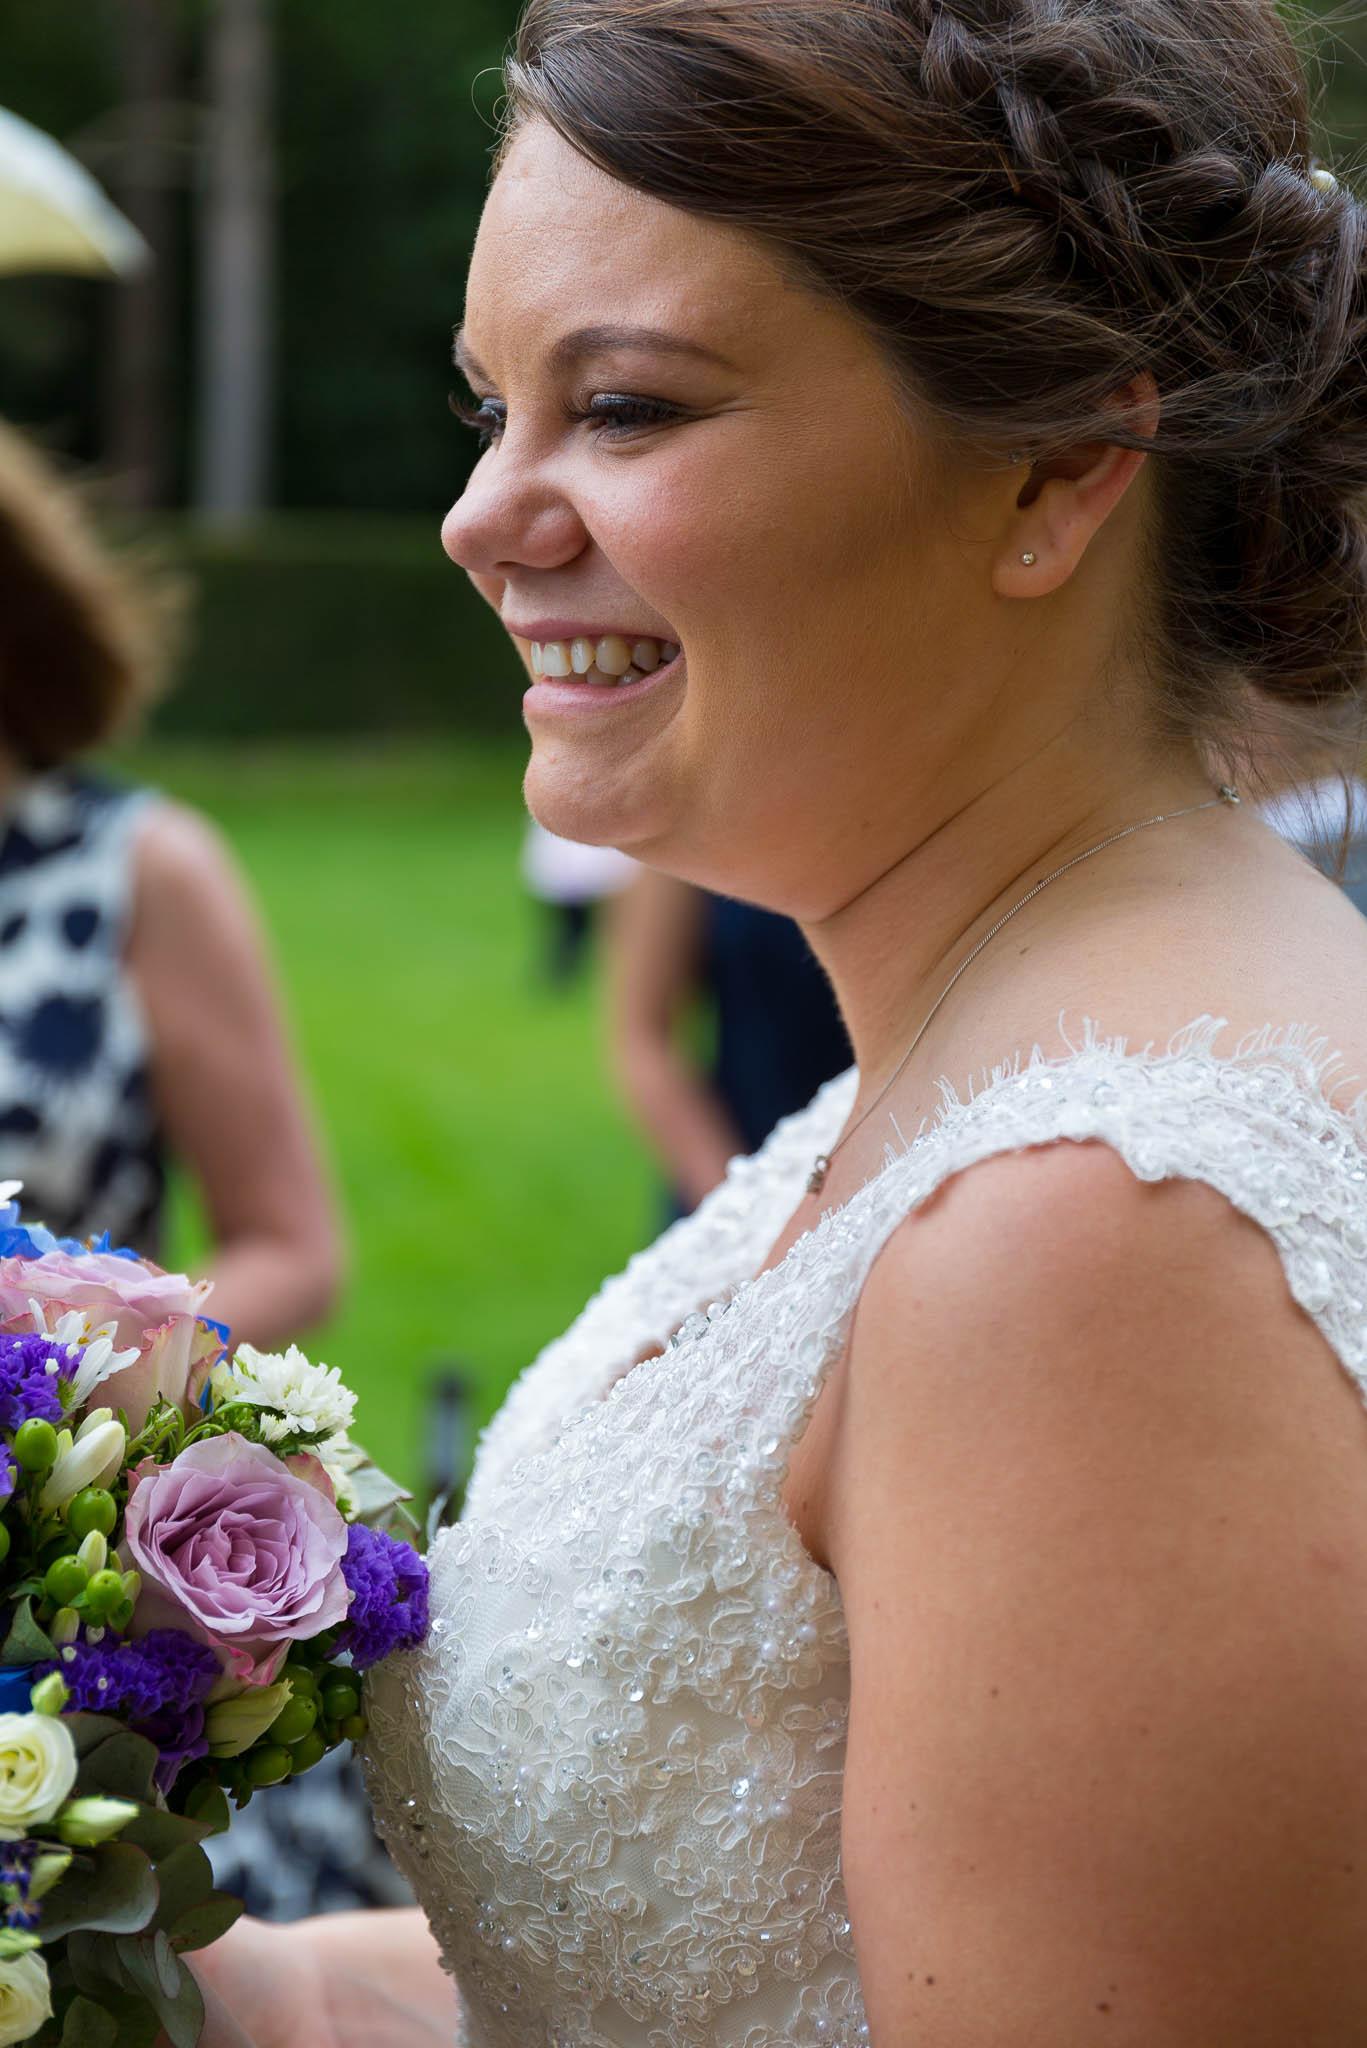 Crathorne Hall Hotel Wedding Photographer67.jpg